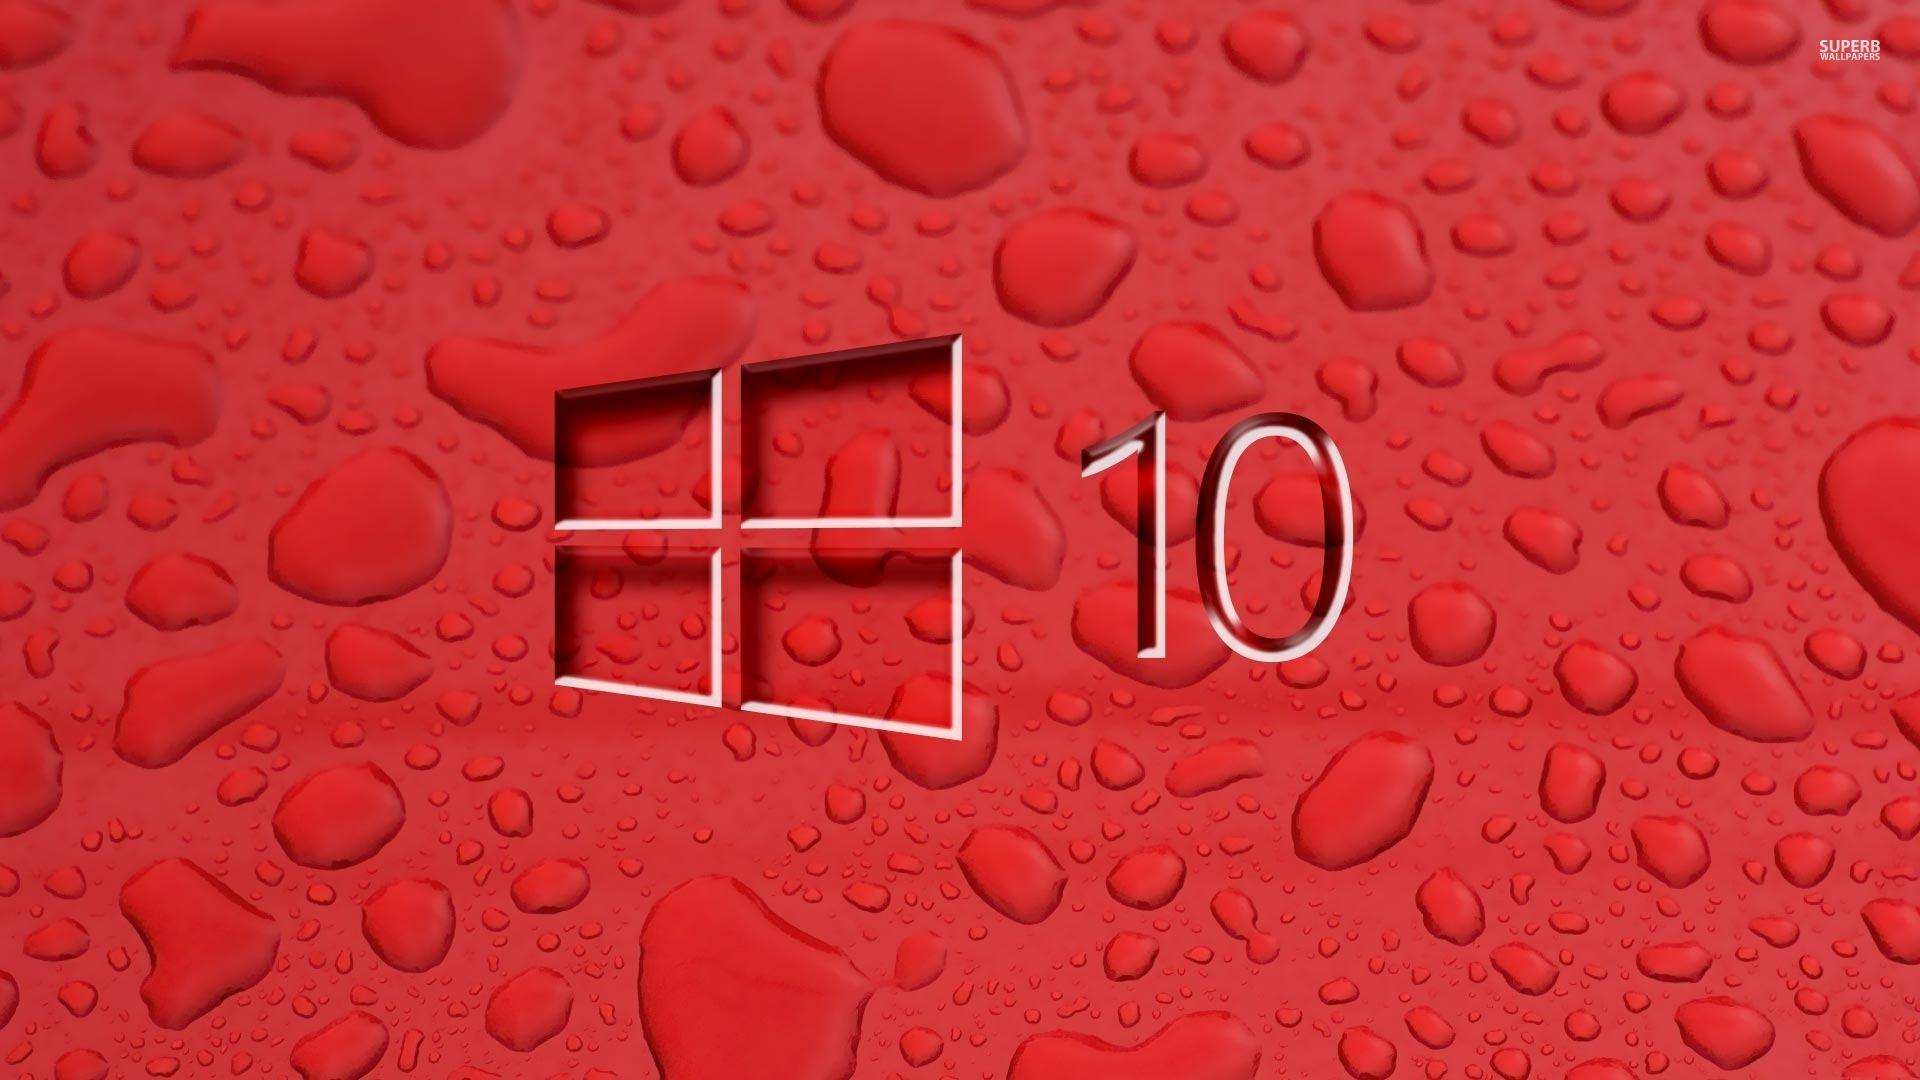 Red Window 10 Wallpaper For Pc - HD Wallpaper